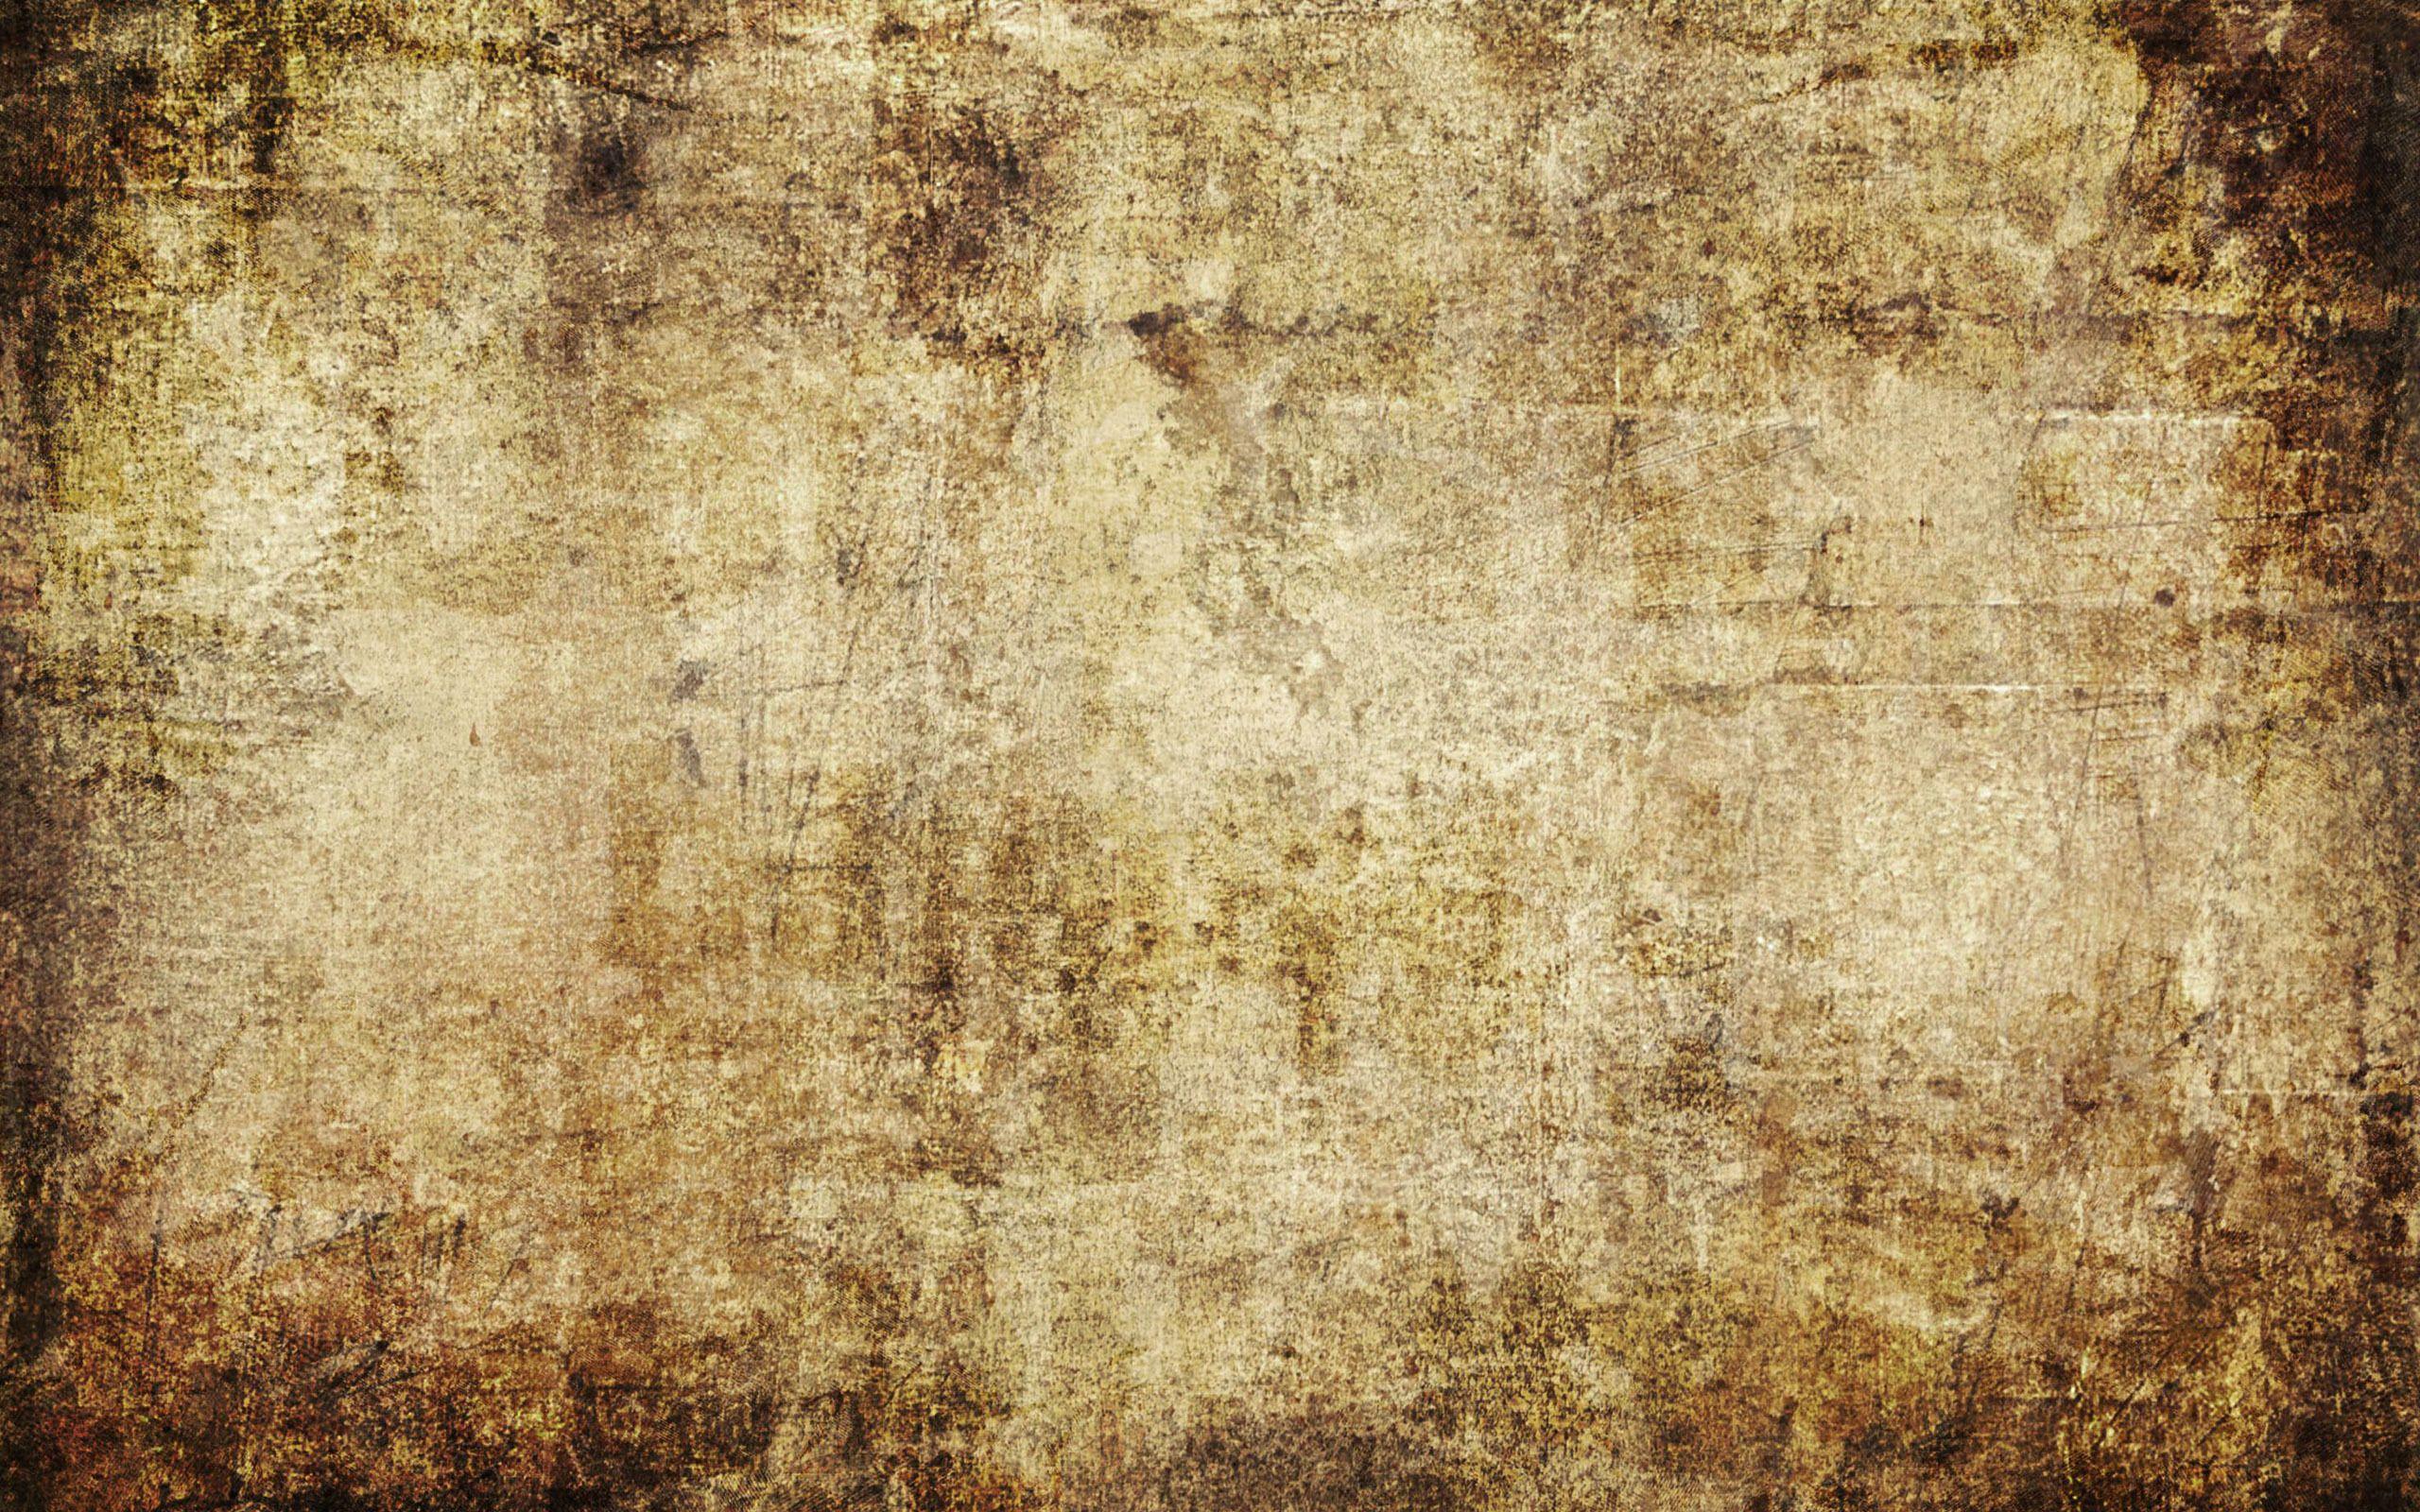 Grunge Texture Wallpaper 16862 20151104225135 563a8bf789535 Jpg 2560 1600 Grunge Textures Textured Wallpaper Texture Background Hd